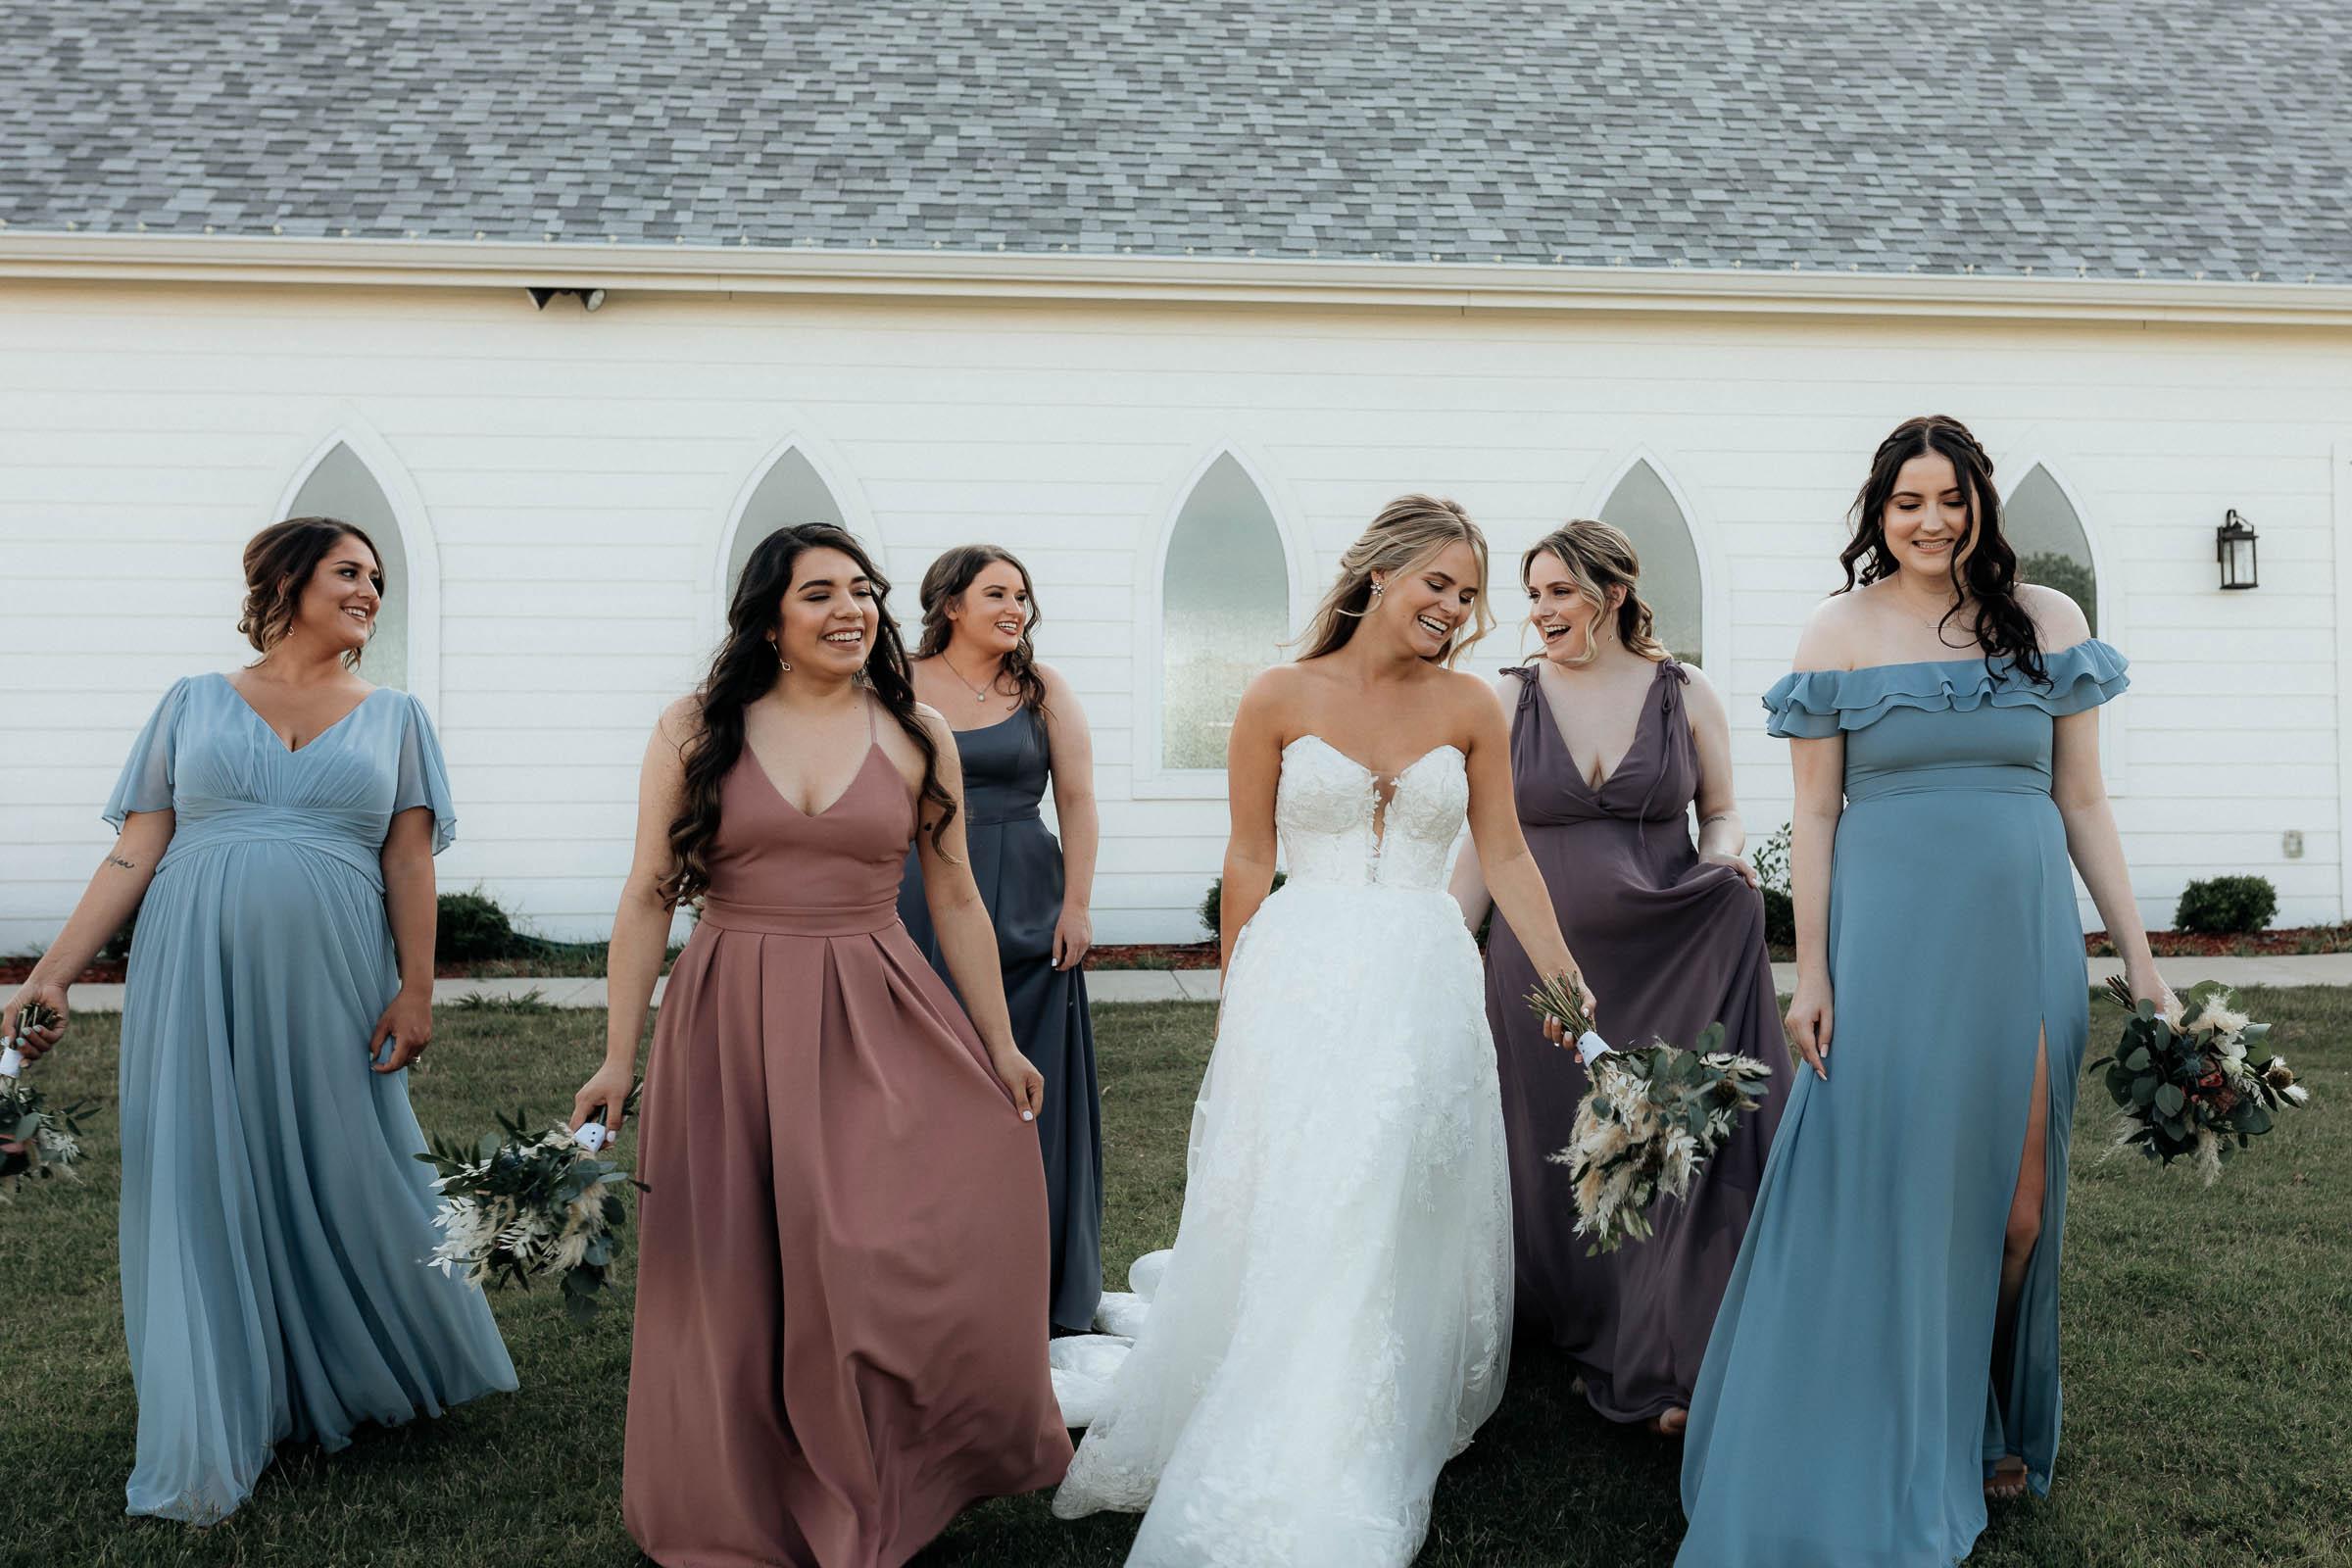 bridesmaids walking and posing for wedding photo